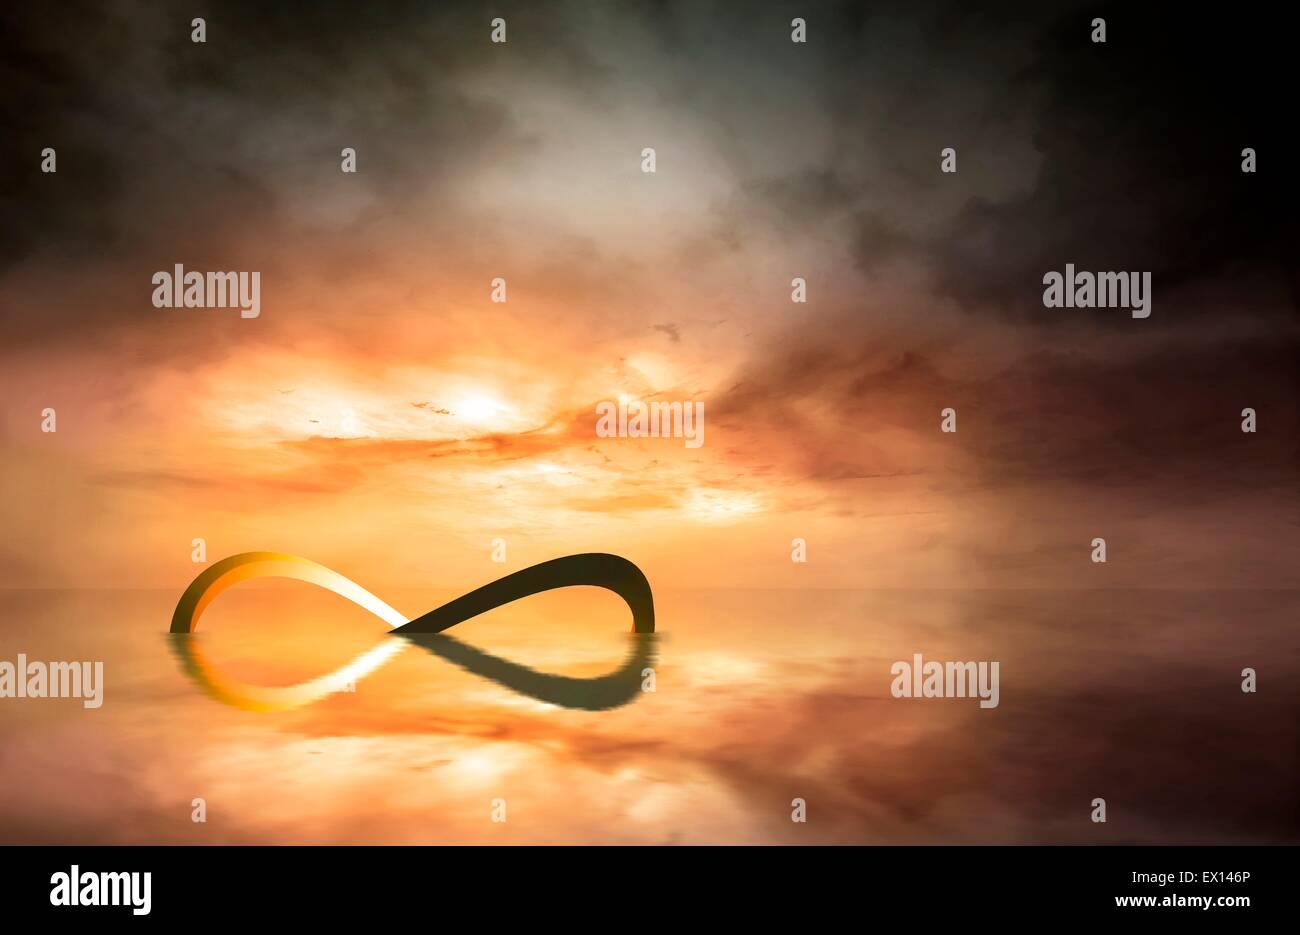 Infinity Symbol Mathematics Stock Photos Infinity Symbol